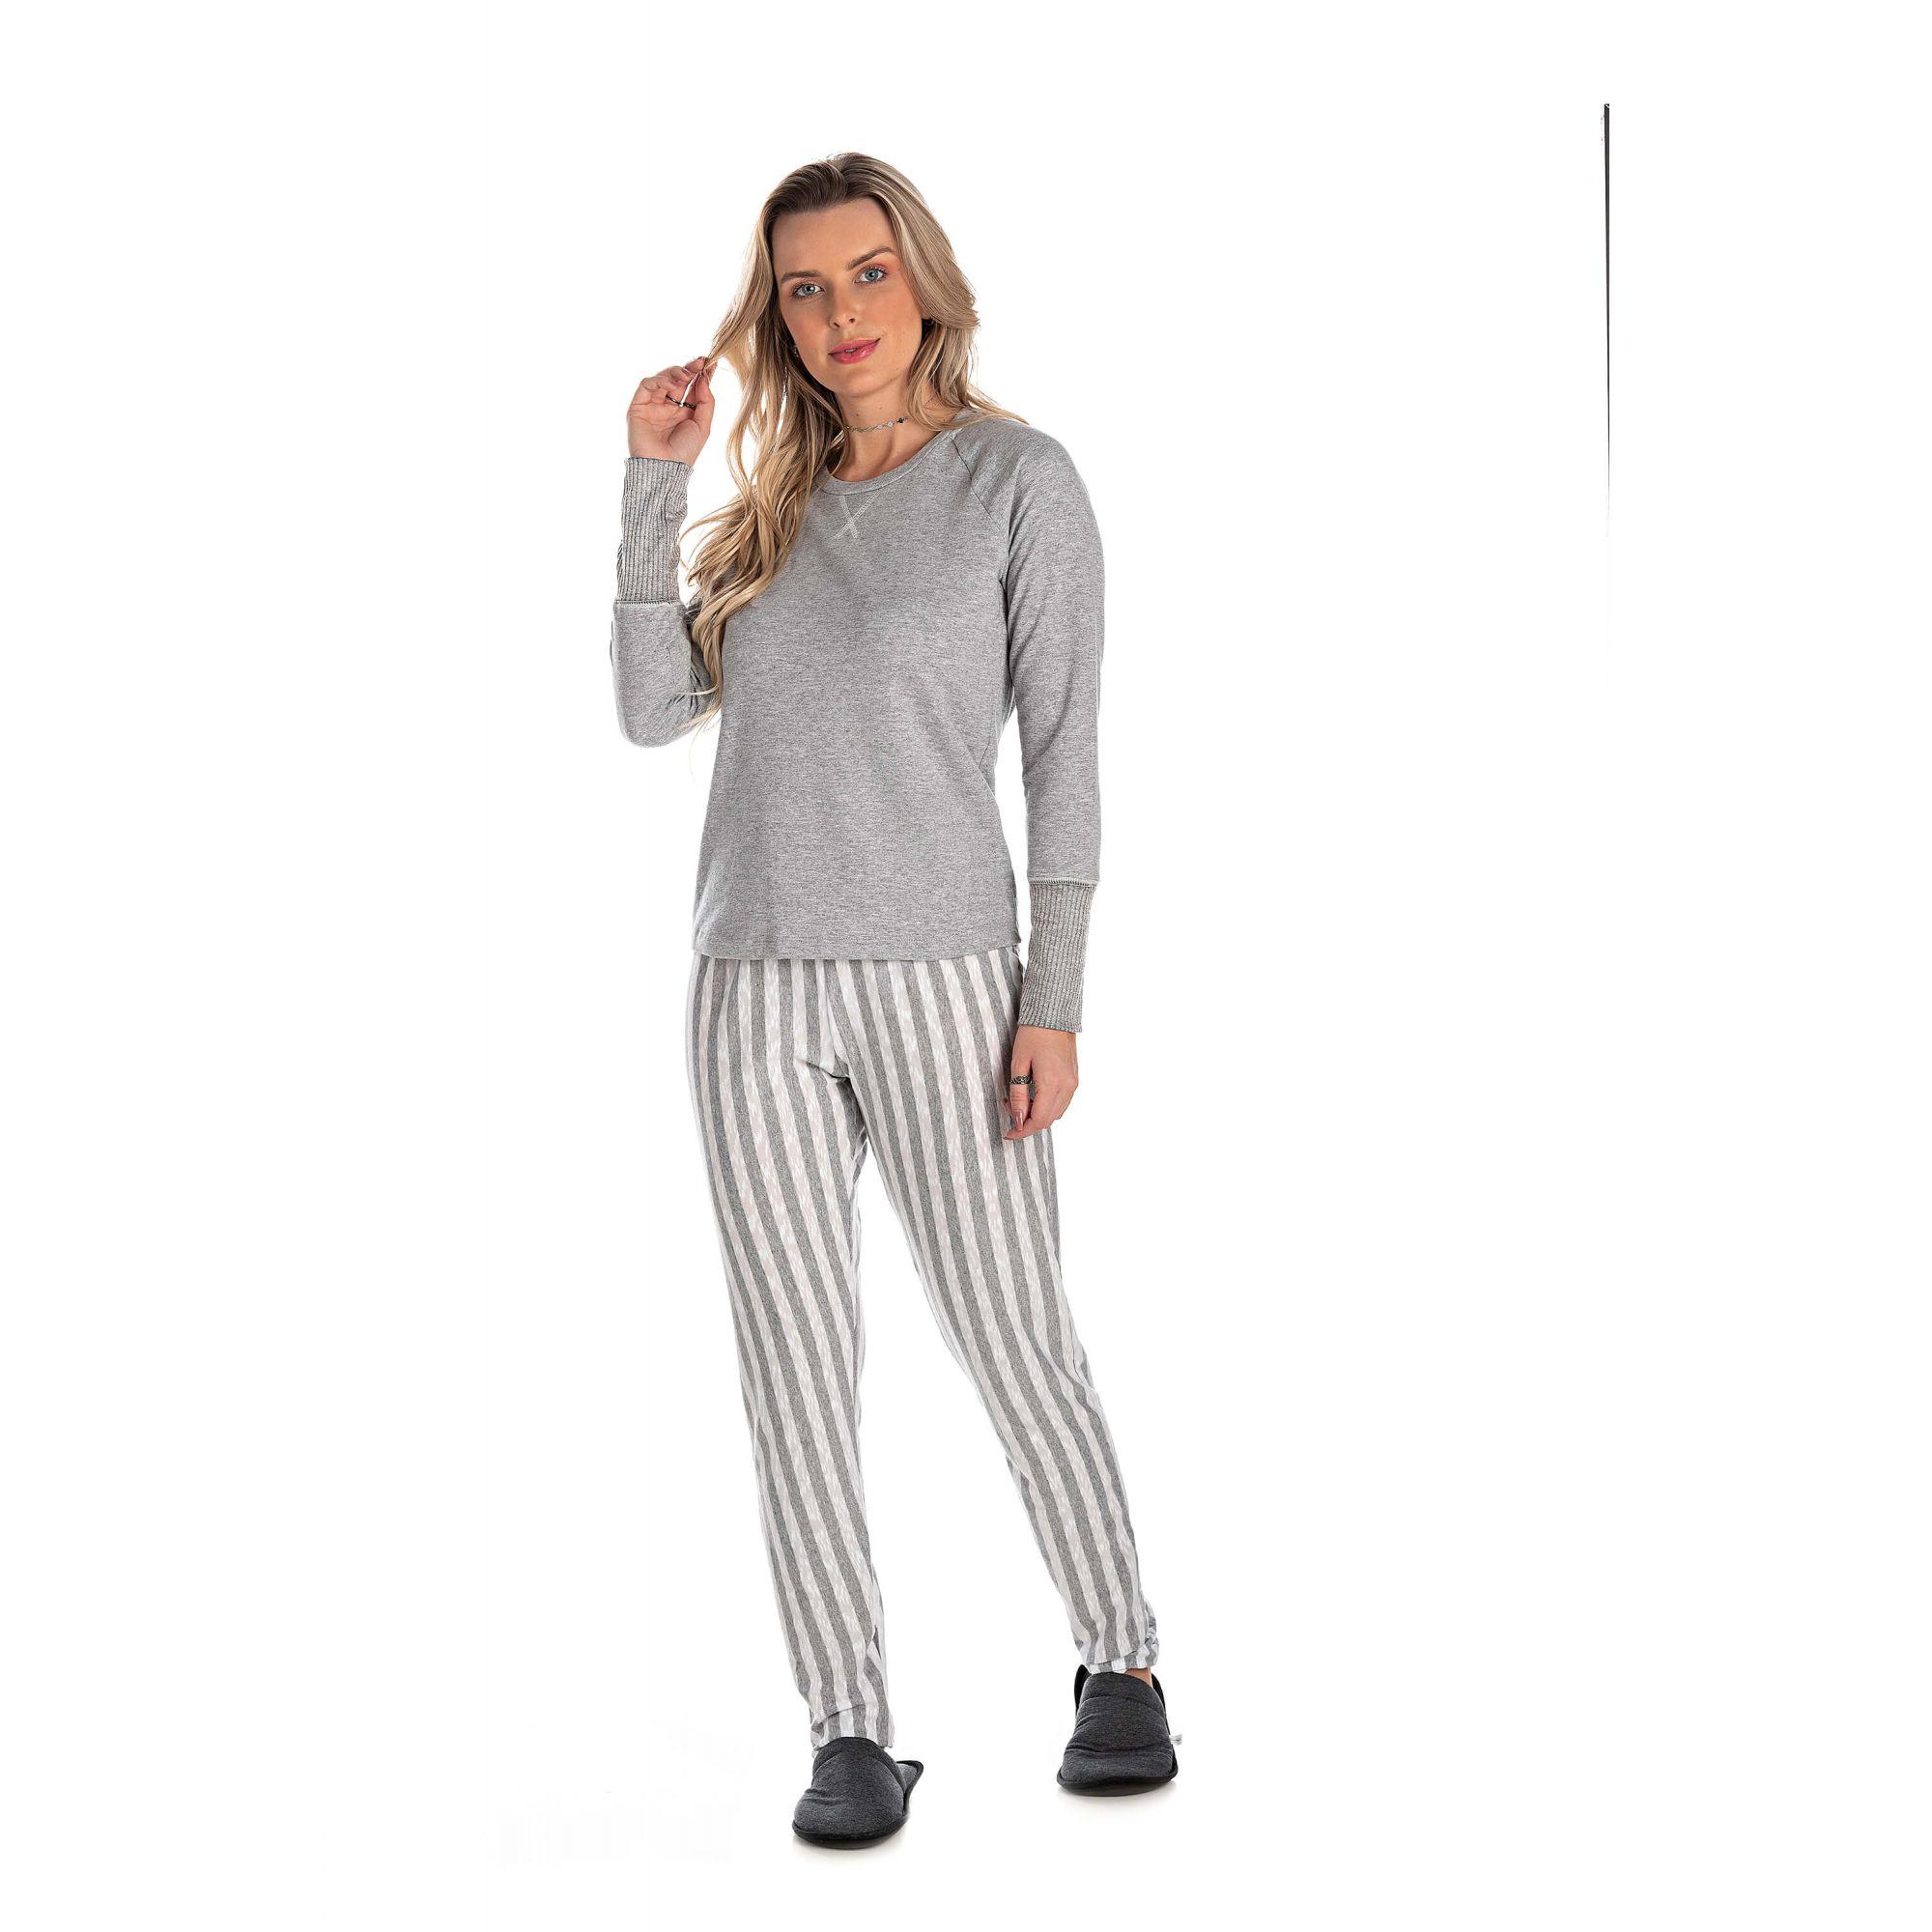 215/A - Pijama Adulto Feminino Longo Com Fio Flamê